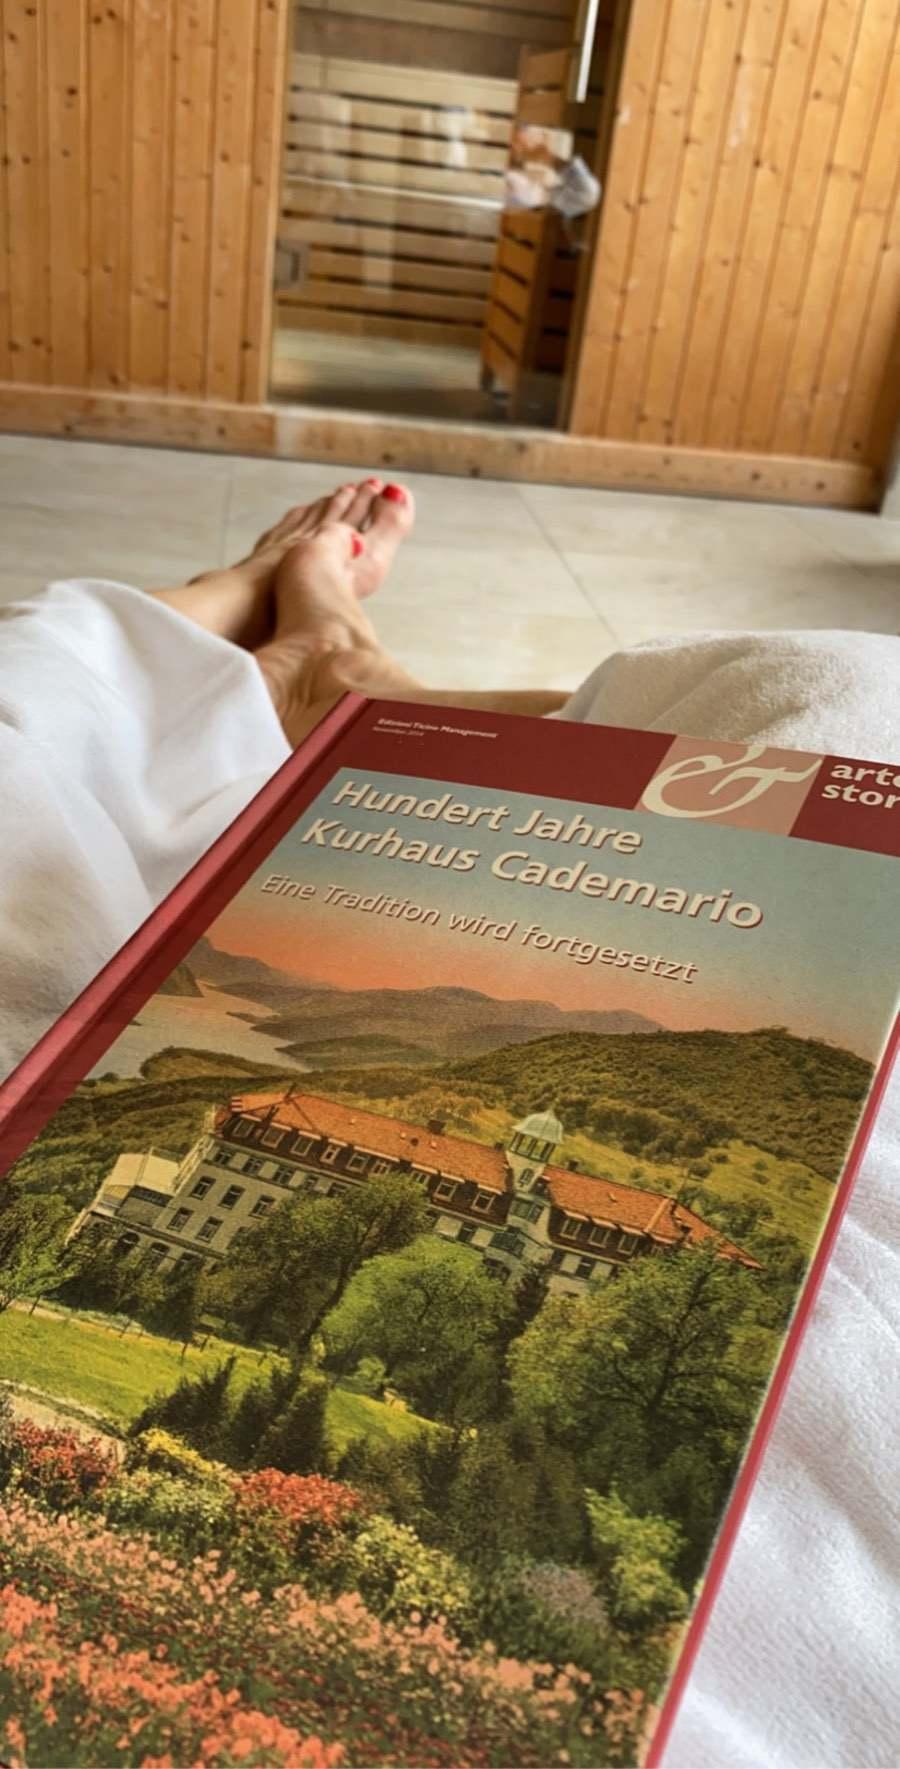 Das Buch Hundert Jahre Kurhaus Cademario